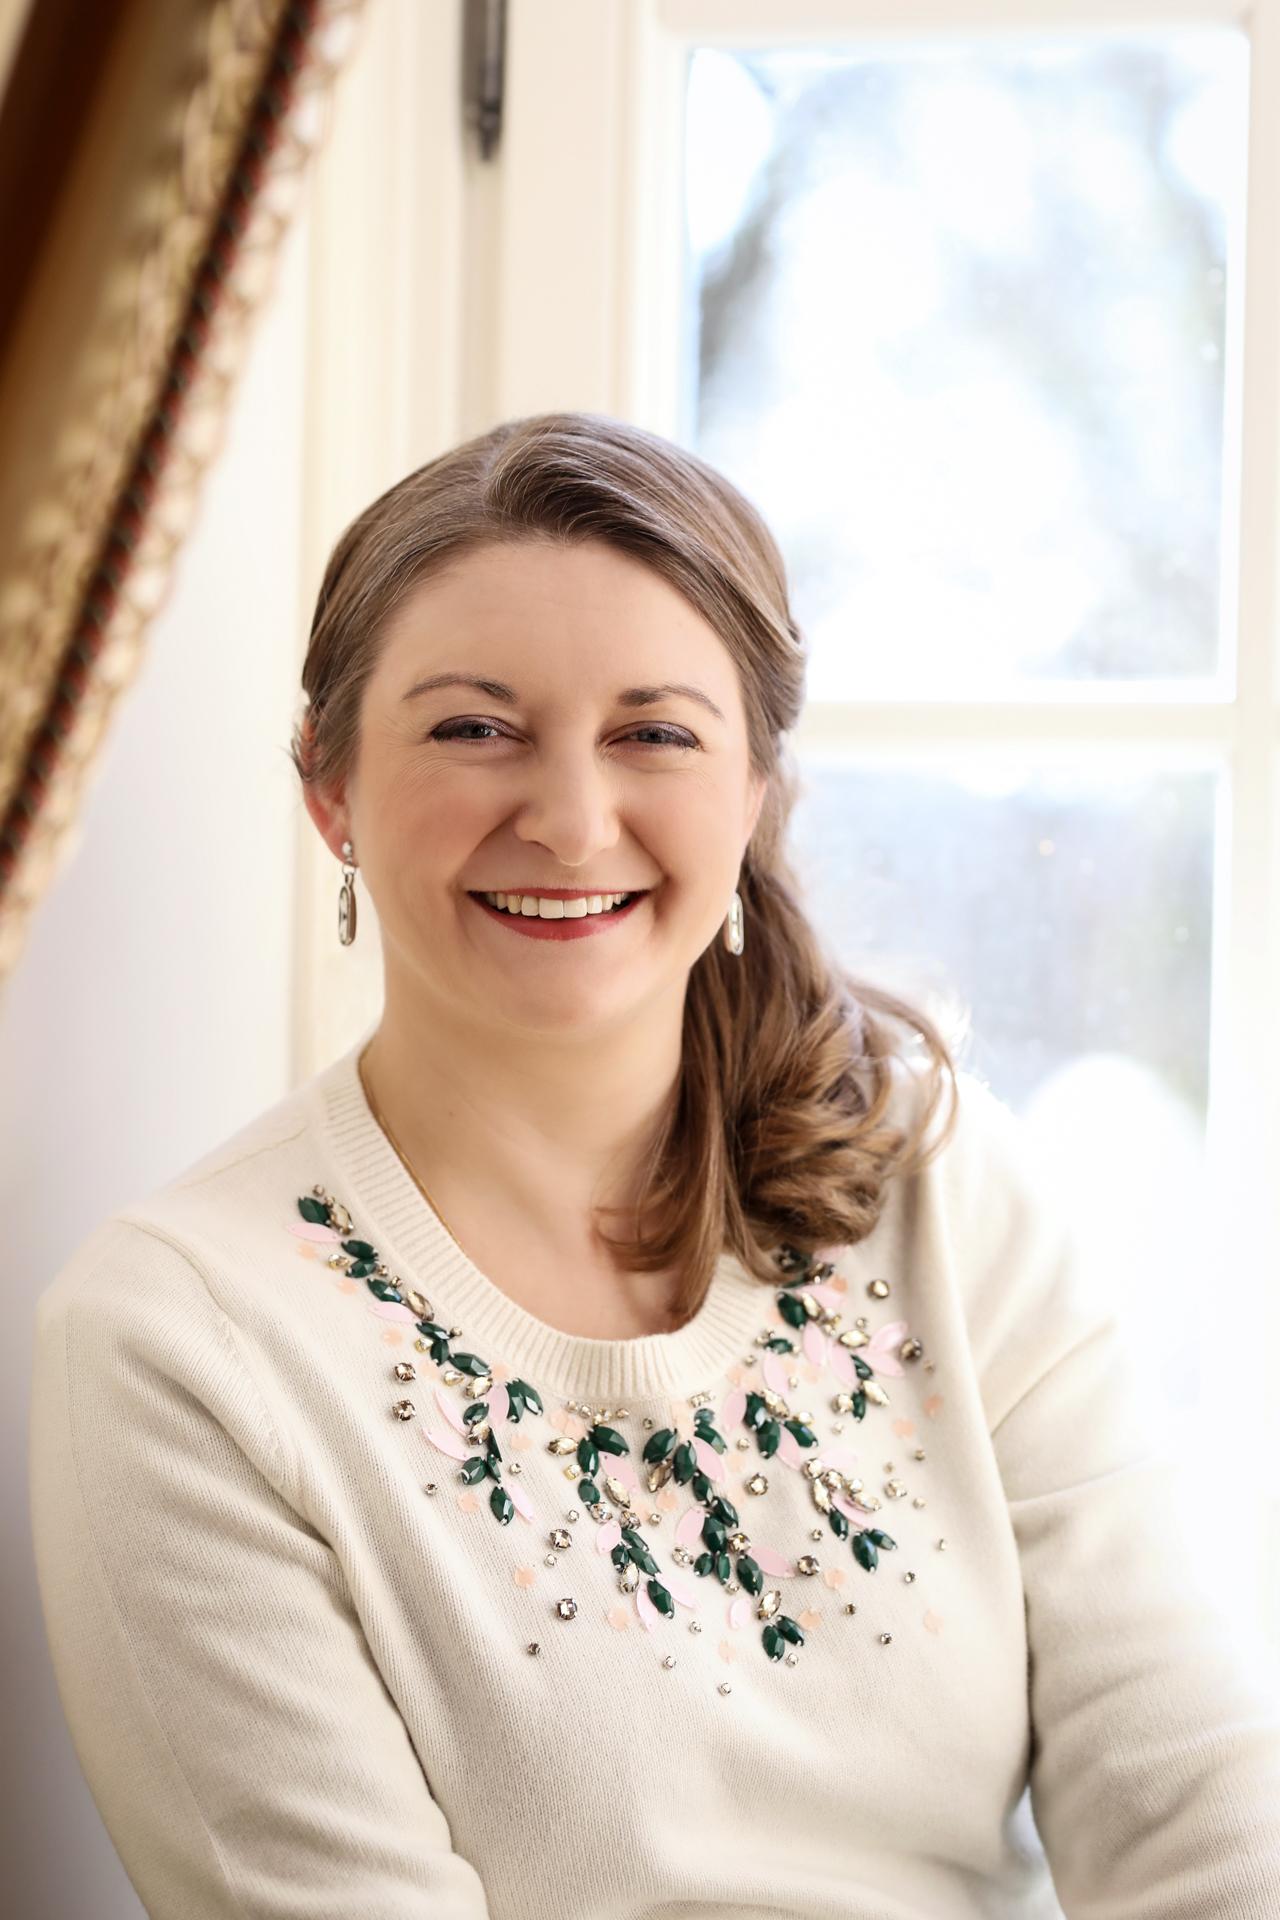 A very Happy 37th birthday to Hereditary Grand Duchess Stéphanie